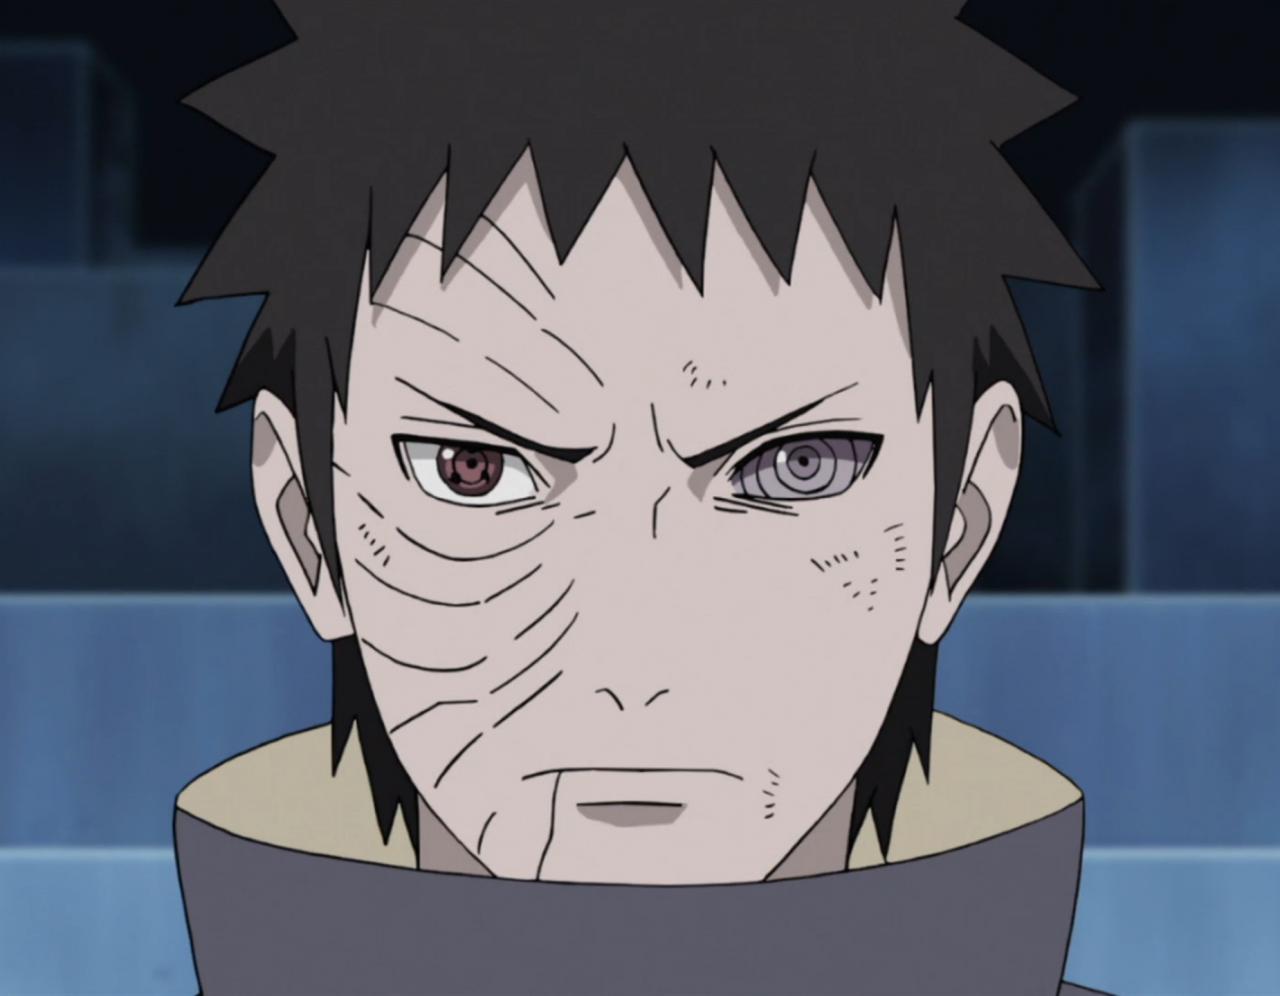 Naruto Shippuden - Obito Uchiwa